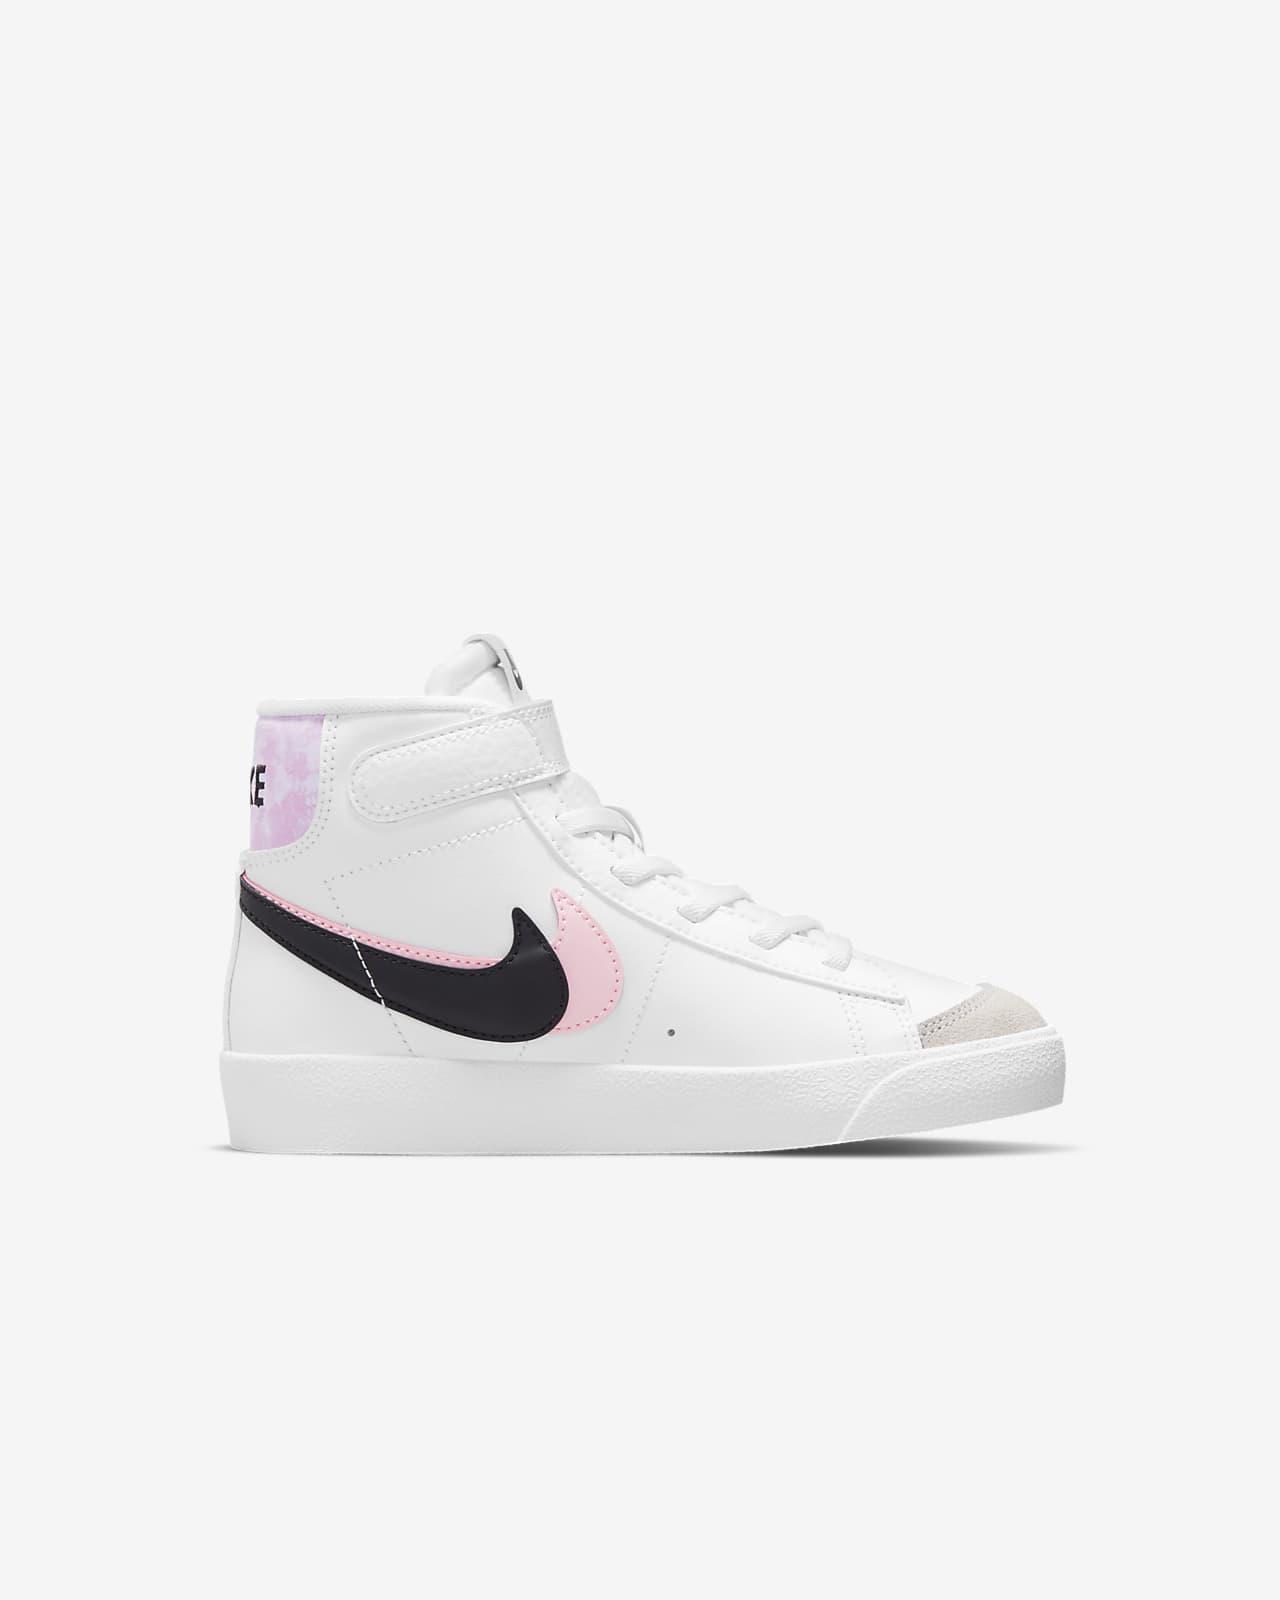 Chaussure Nike Blazer Mid '77 SE pour Jeune enfant. Nike LU